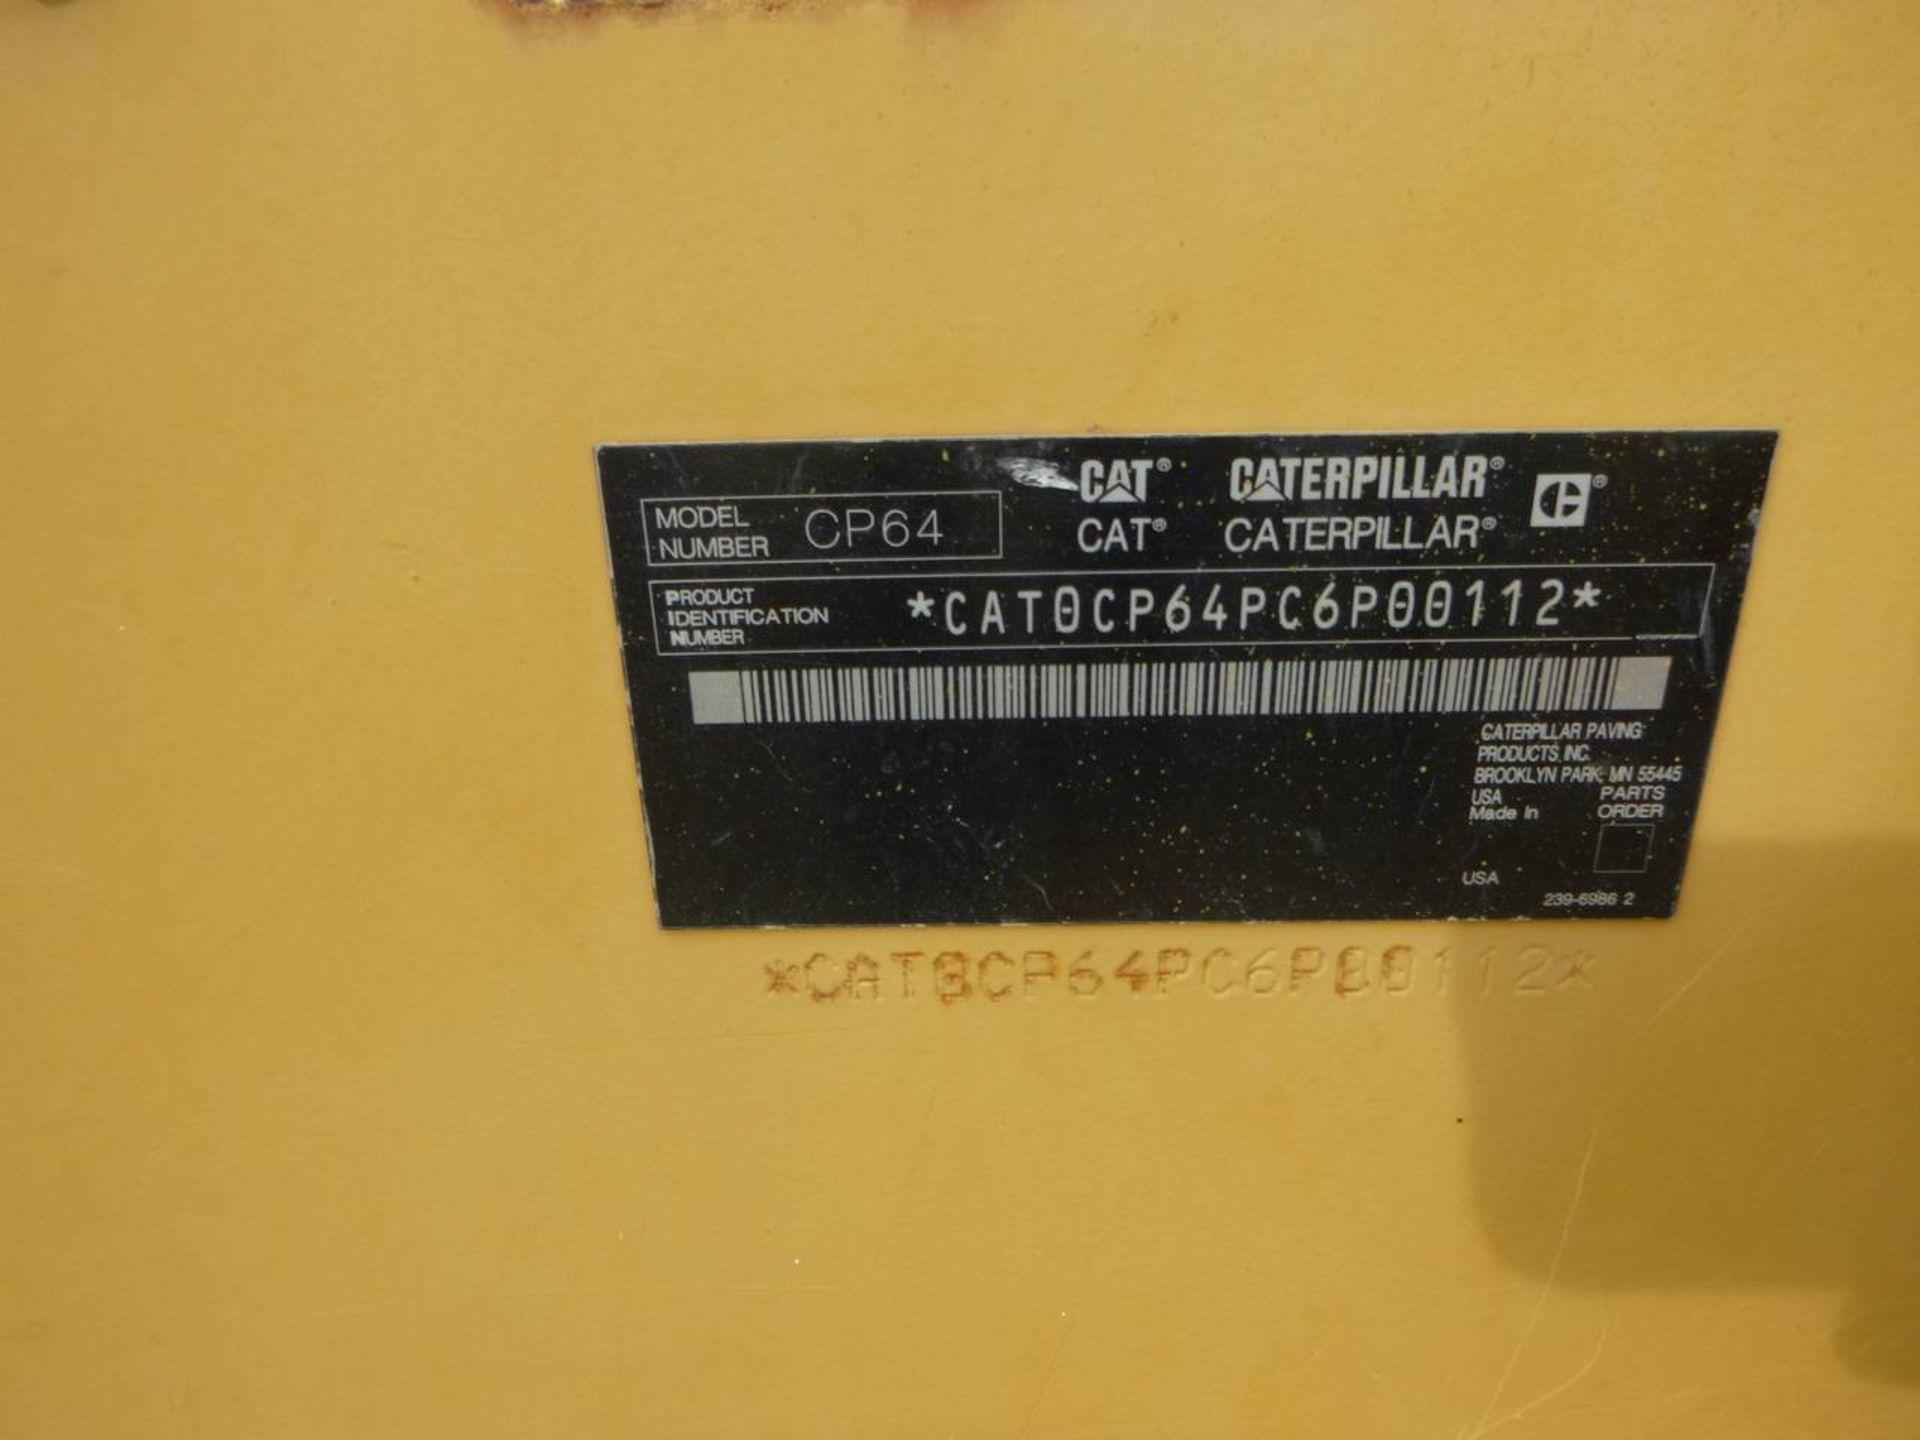 2009 Caterpillar CP64 Compactor - Image 9 of 9